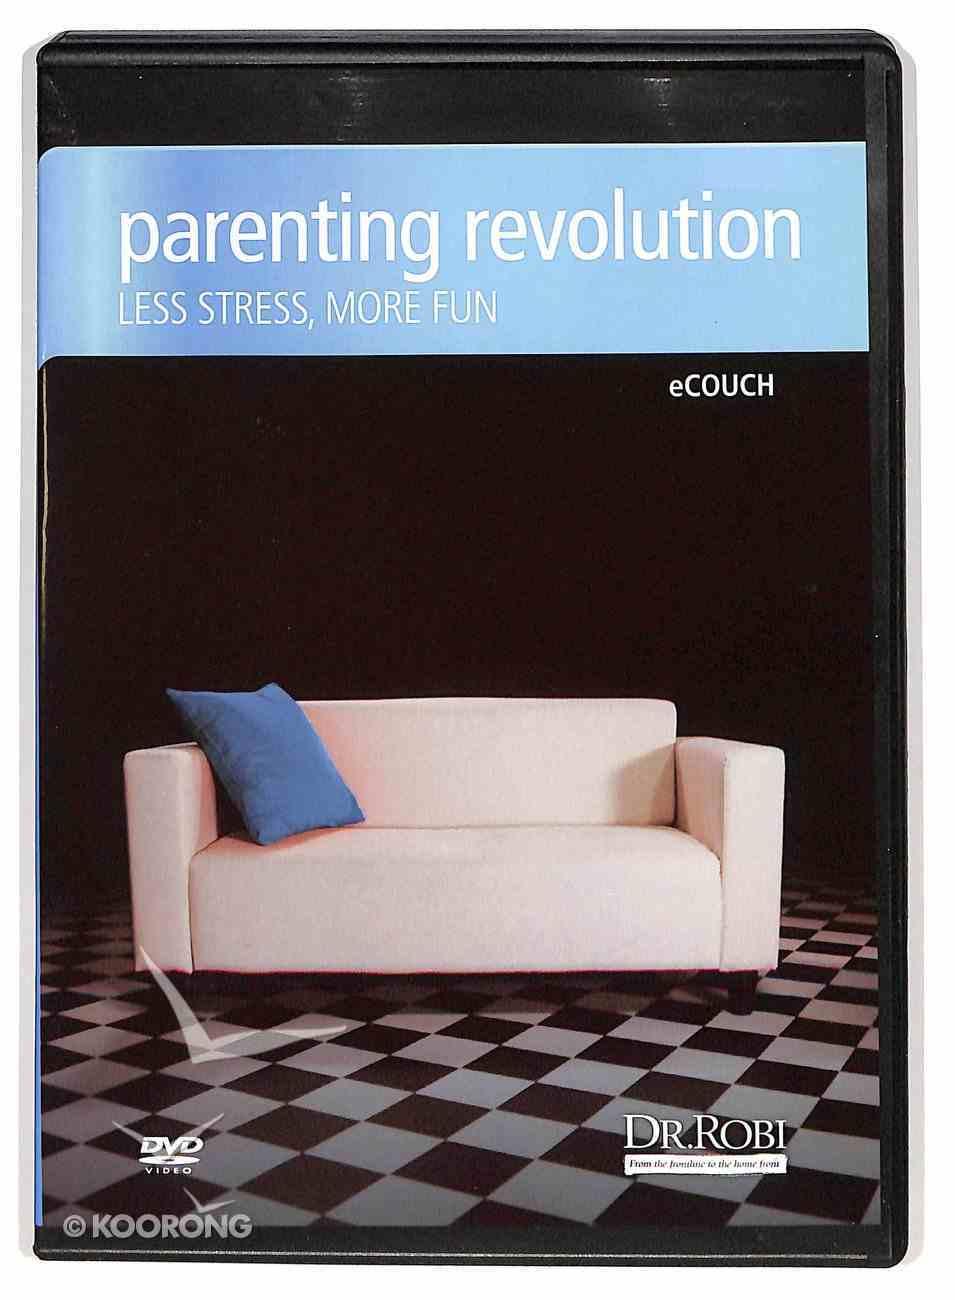 Parenting Revolution (Ecouch Series) DVD